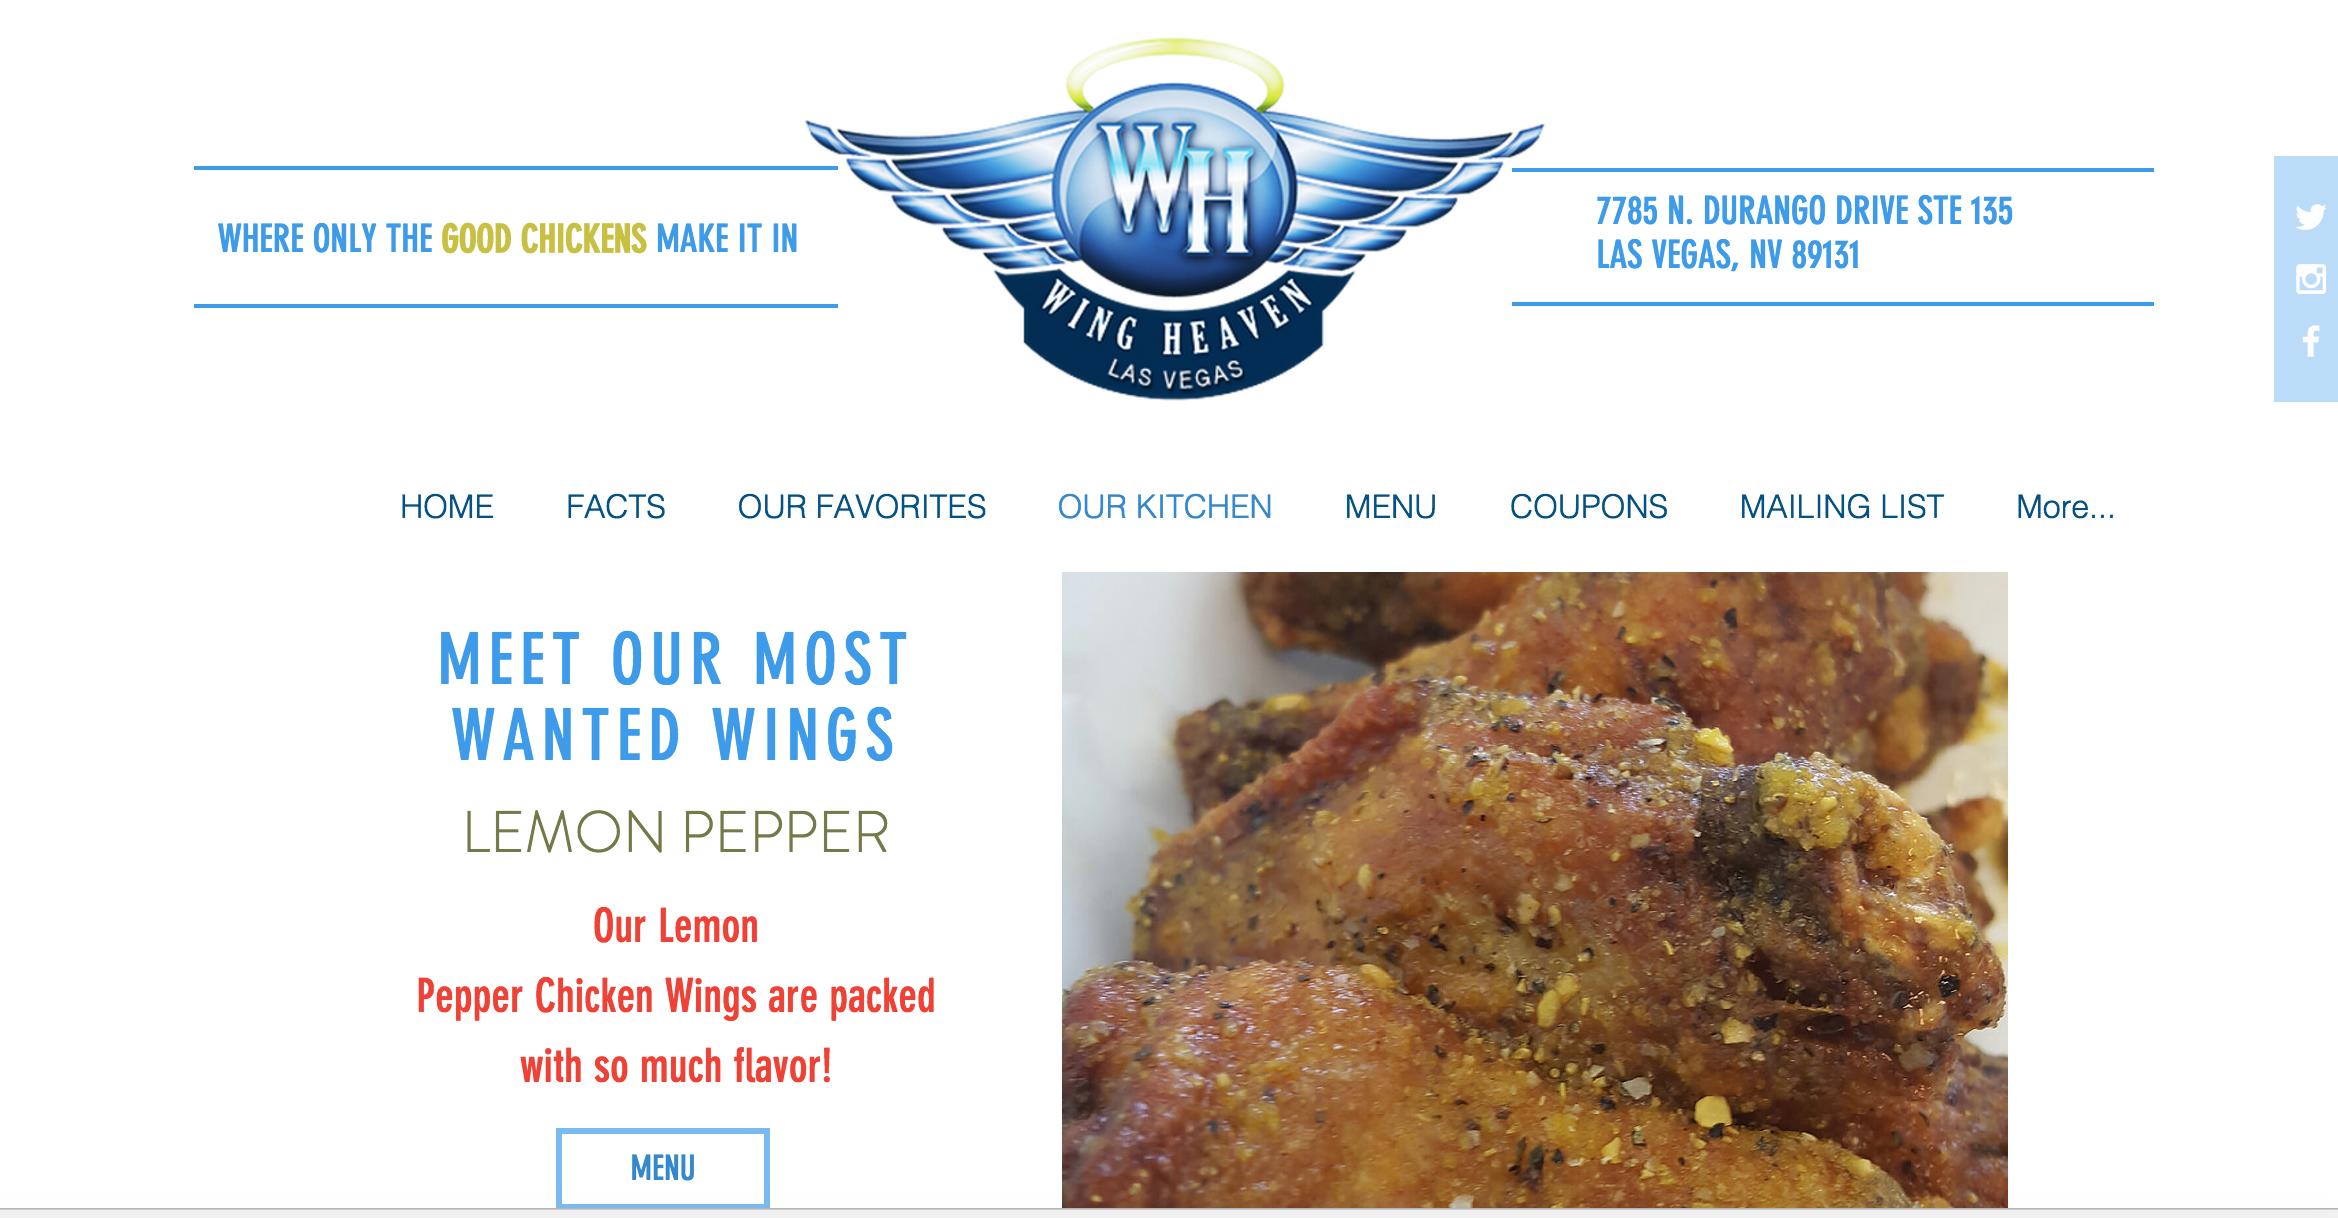 www.wingheavenlvnv.com